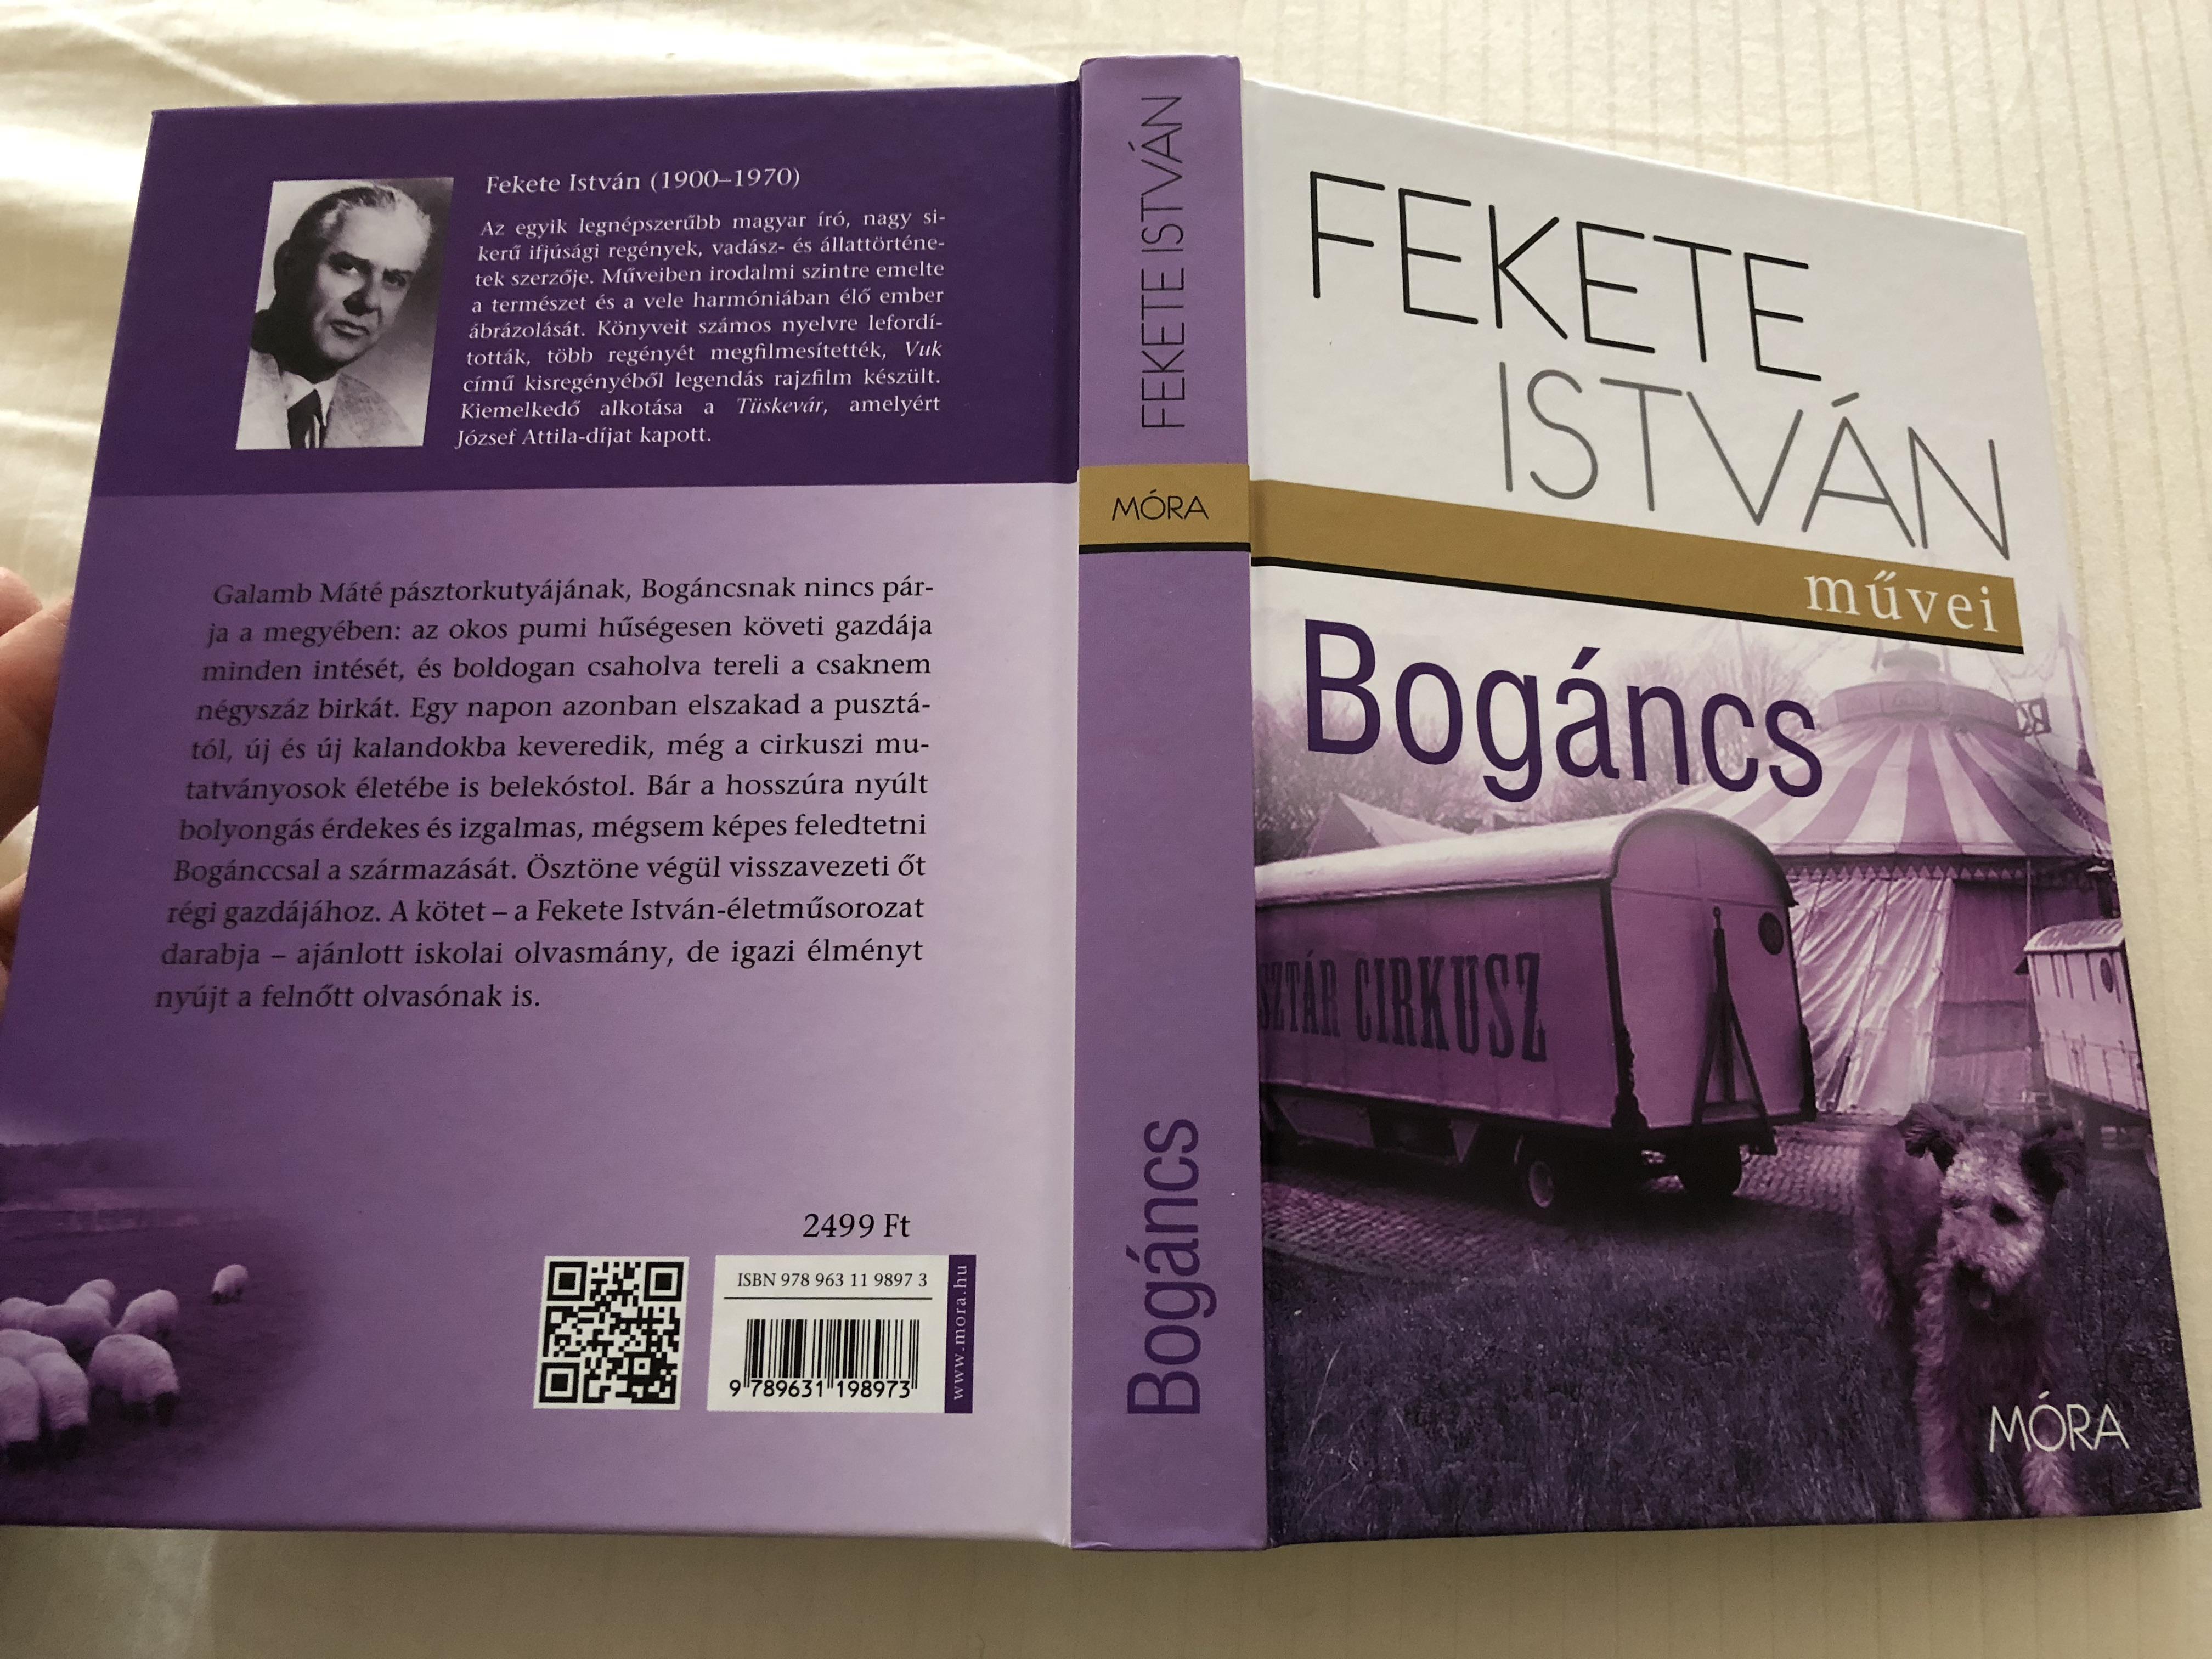 bog-ncs-by-fekete-istv-n-m-ra-k-nyvkiad-2015-hardcover-hungarian-literary-classic-9-.jpg